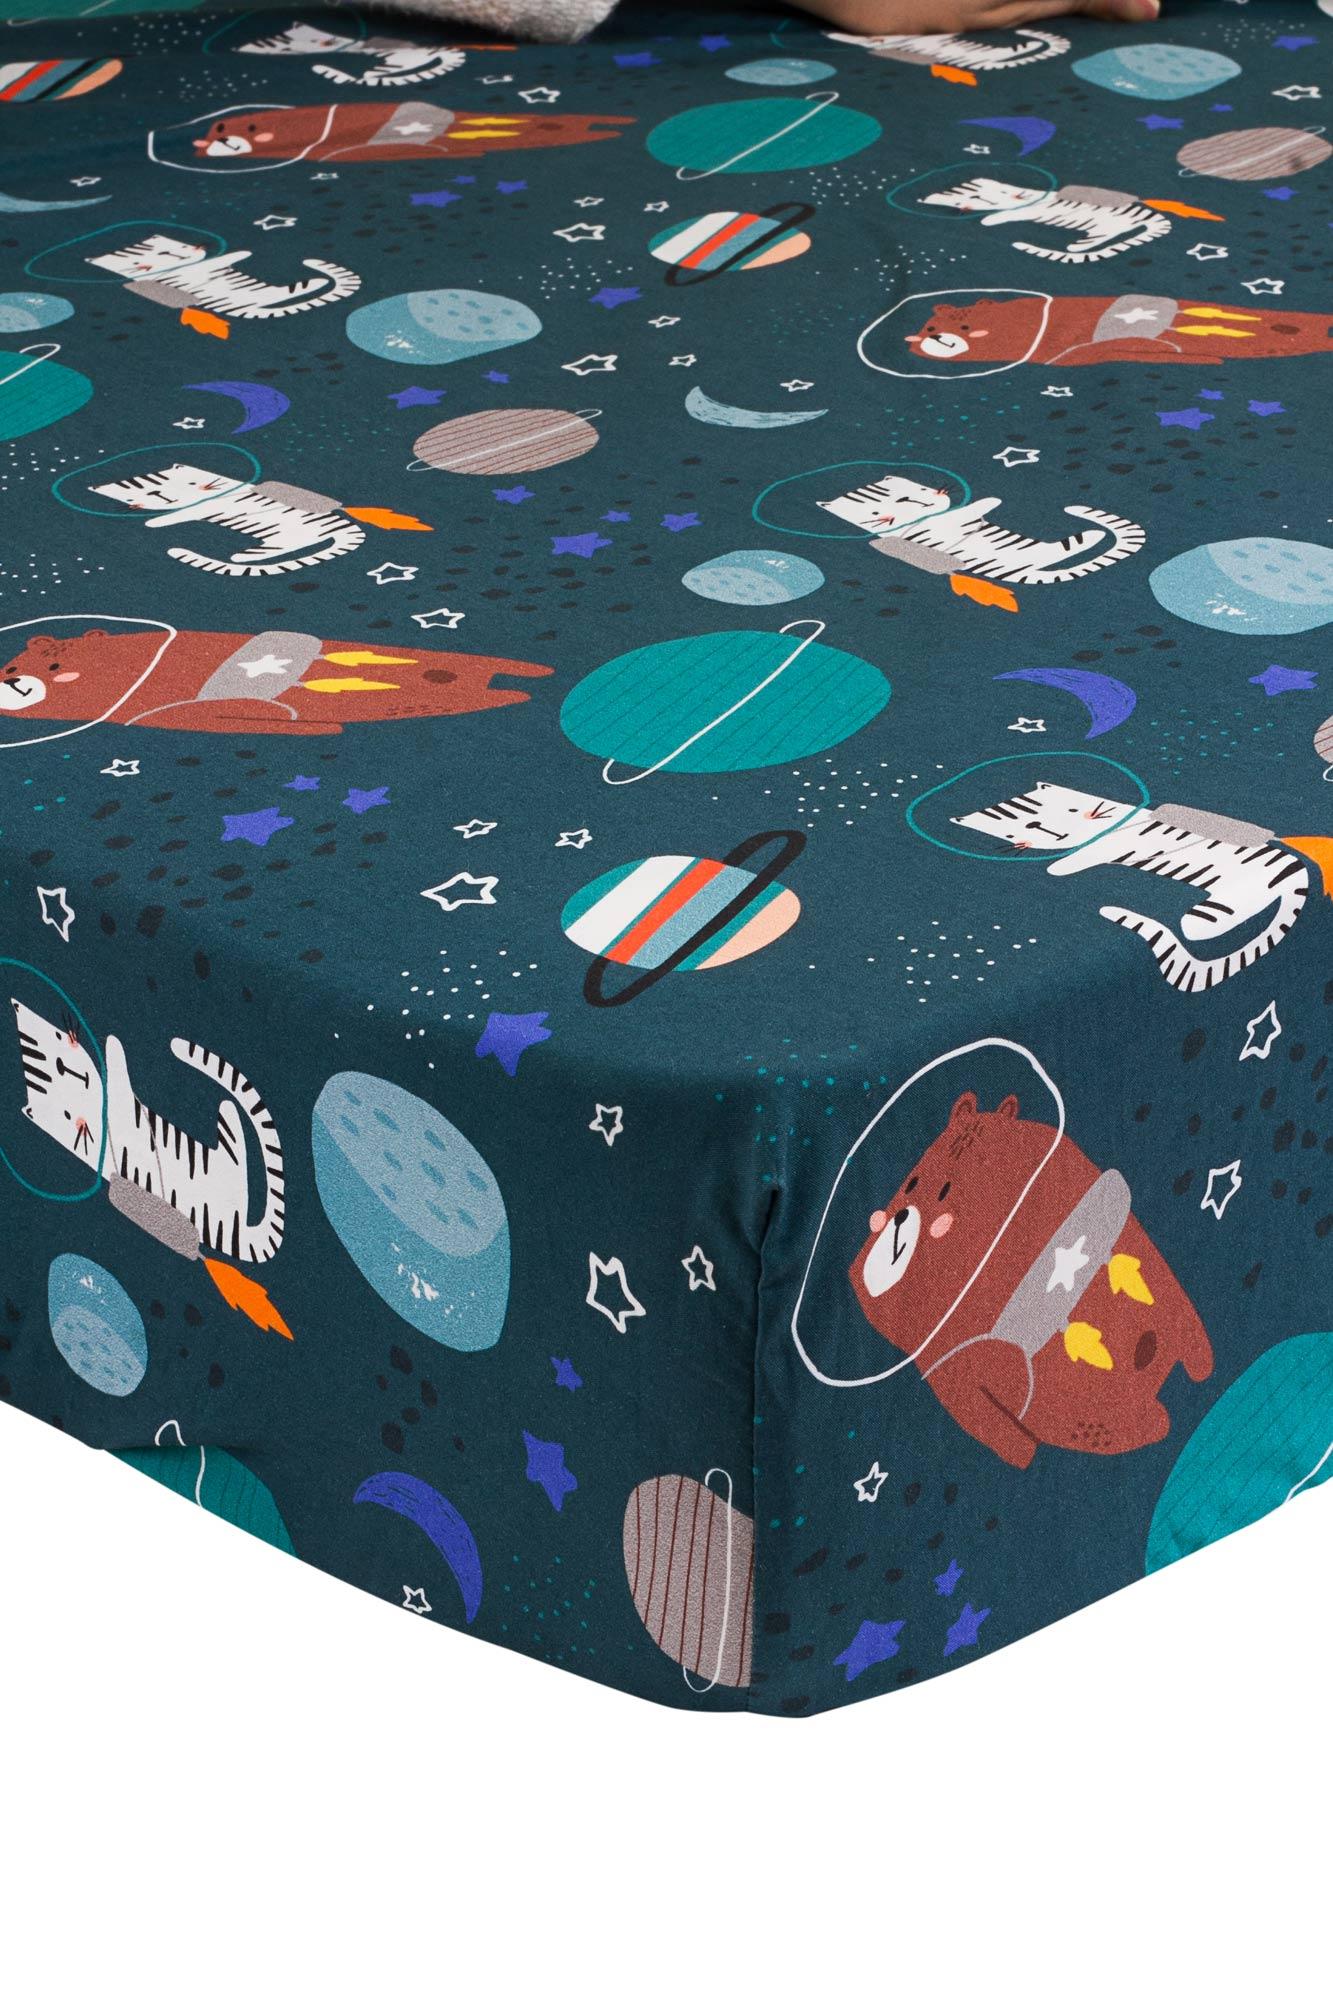 Lençol de elástico mini cama Caça ao Tesouro Cósmico